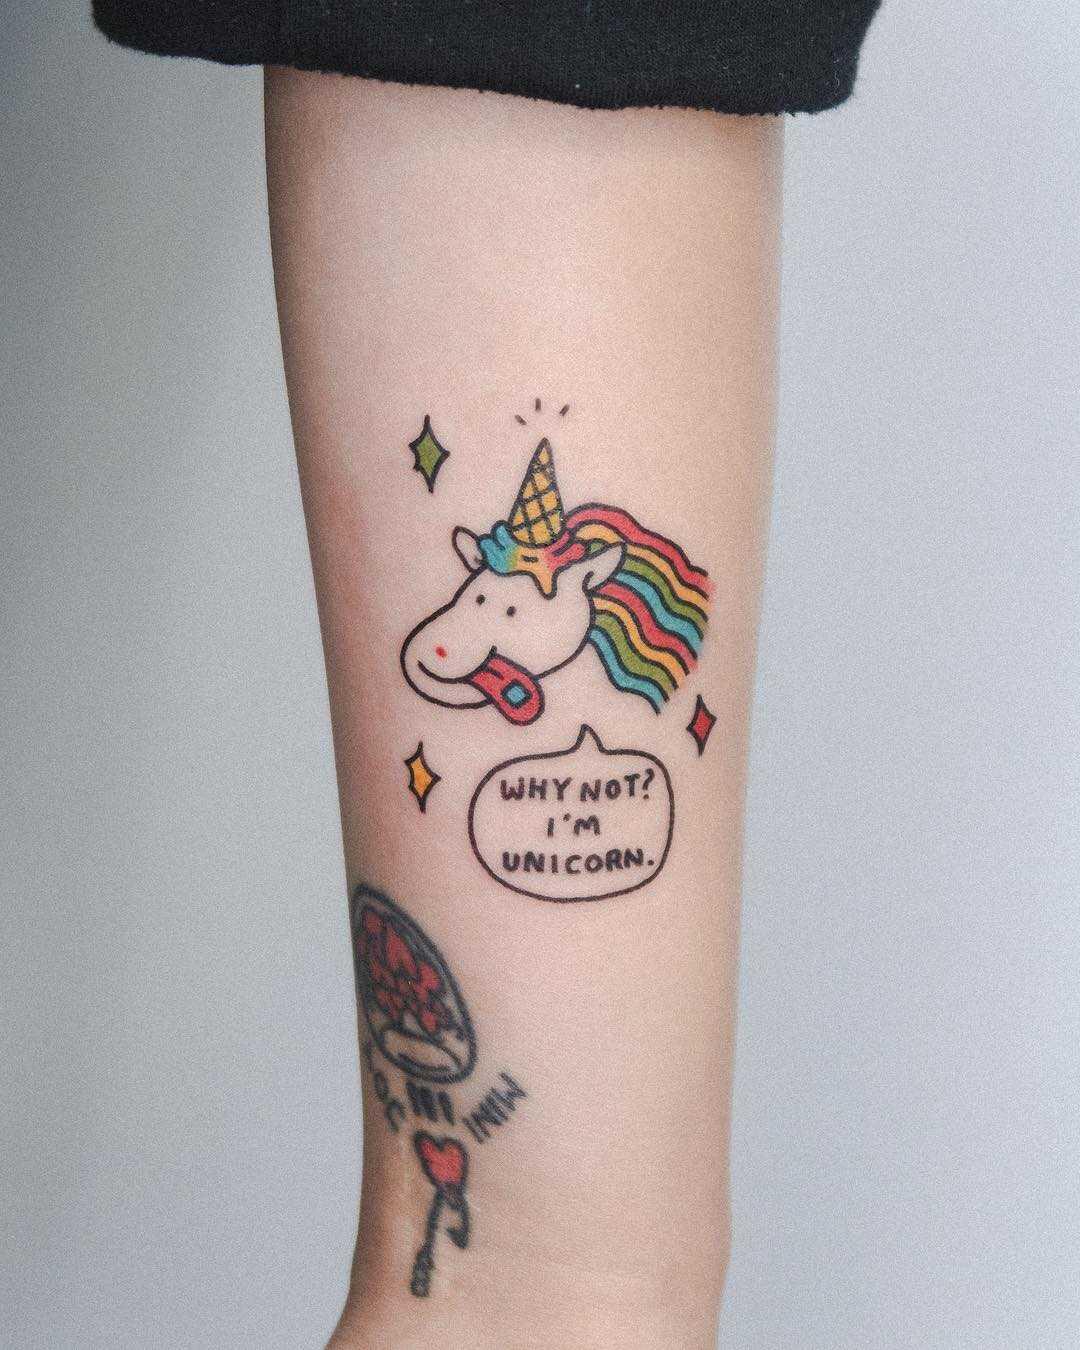 Unicorn by tattooist Bongkee